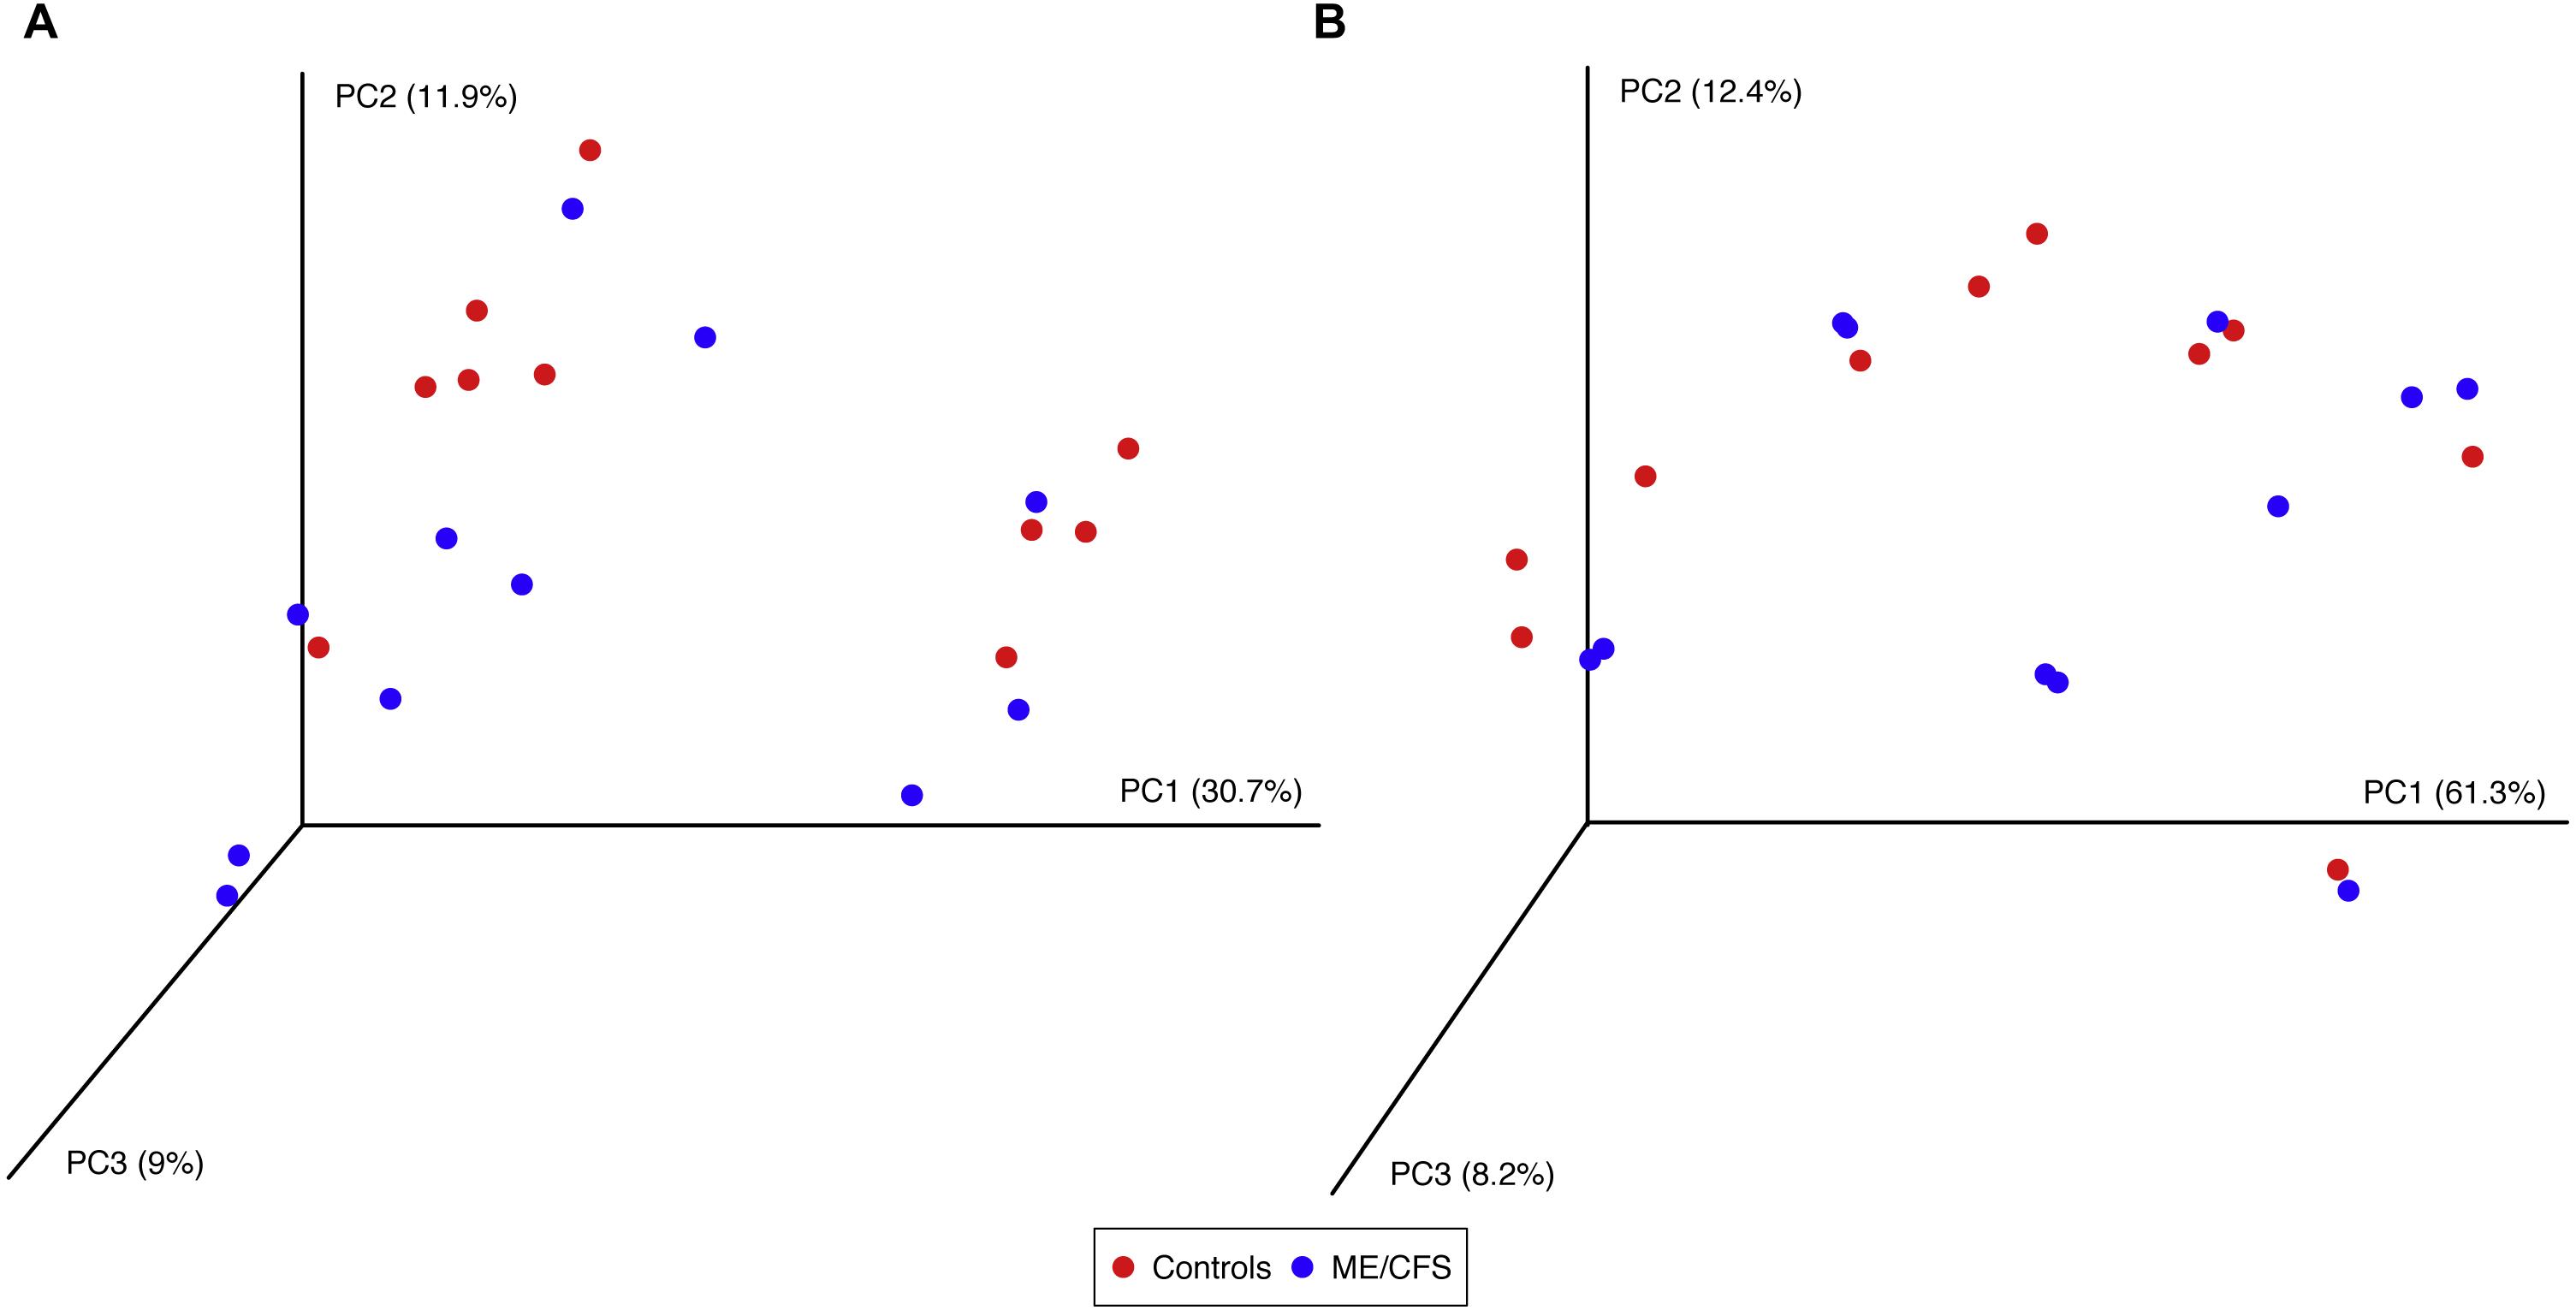 Eukaryotes in the gut microbiota in myalgic encephalomyelitis